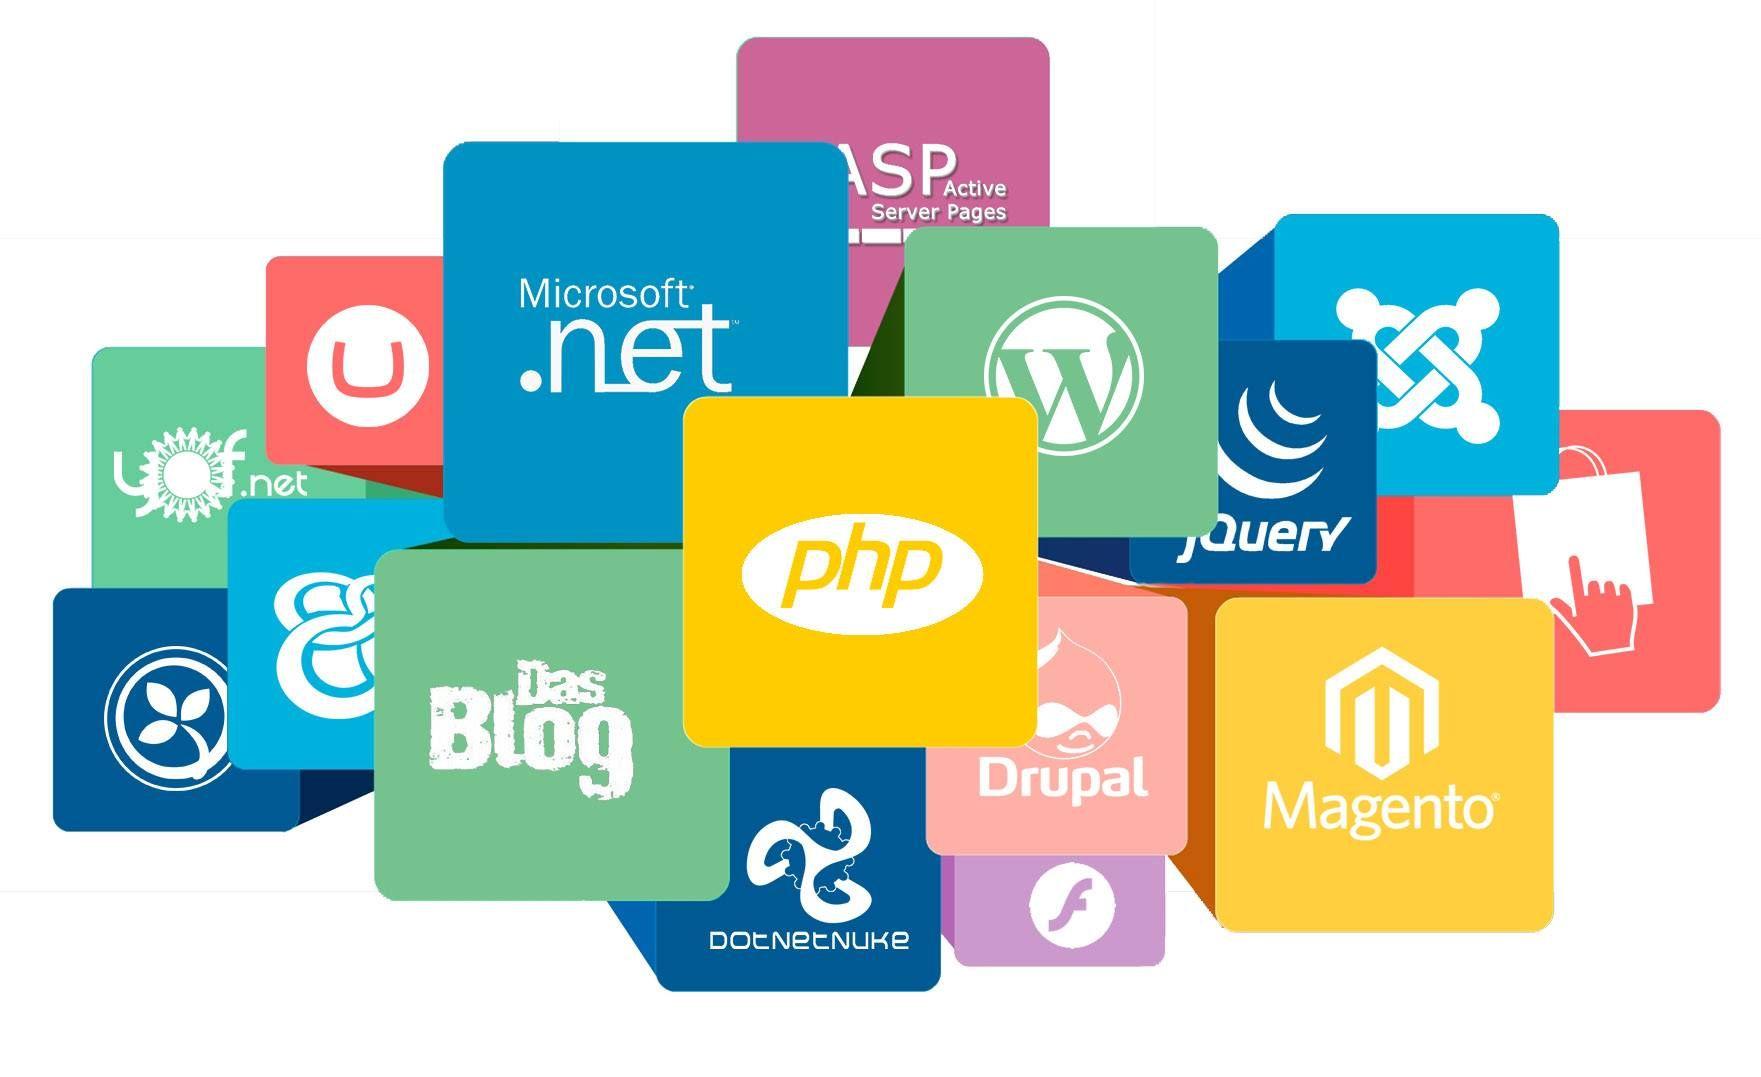 PHP, ANDROID, IOS, ECOMMERCE, ANGULAR, SEO, WORDPRESS